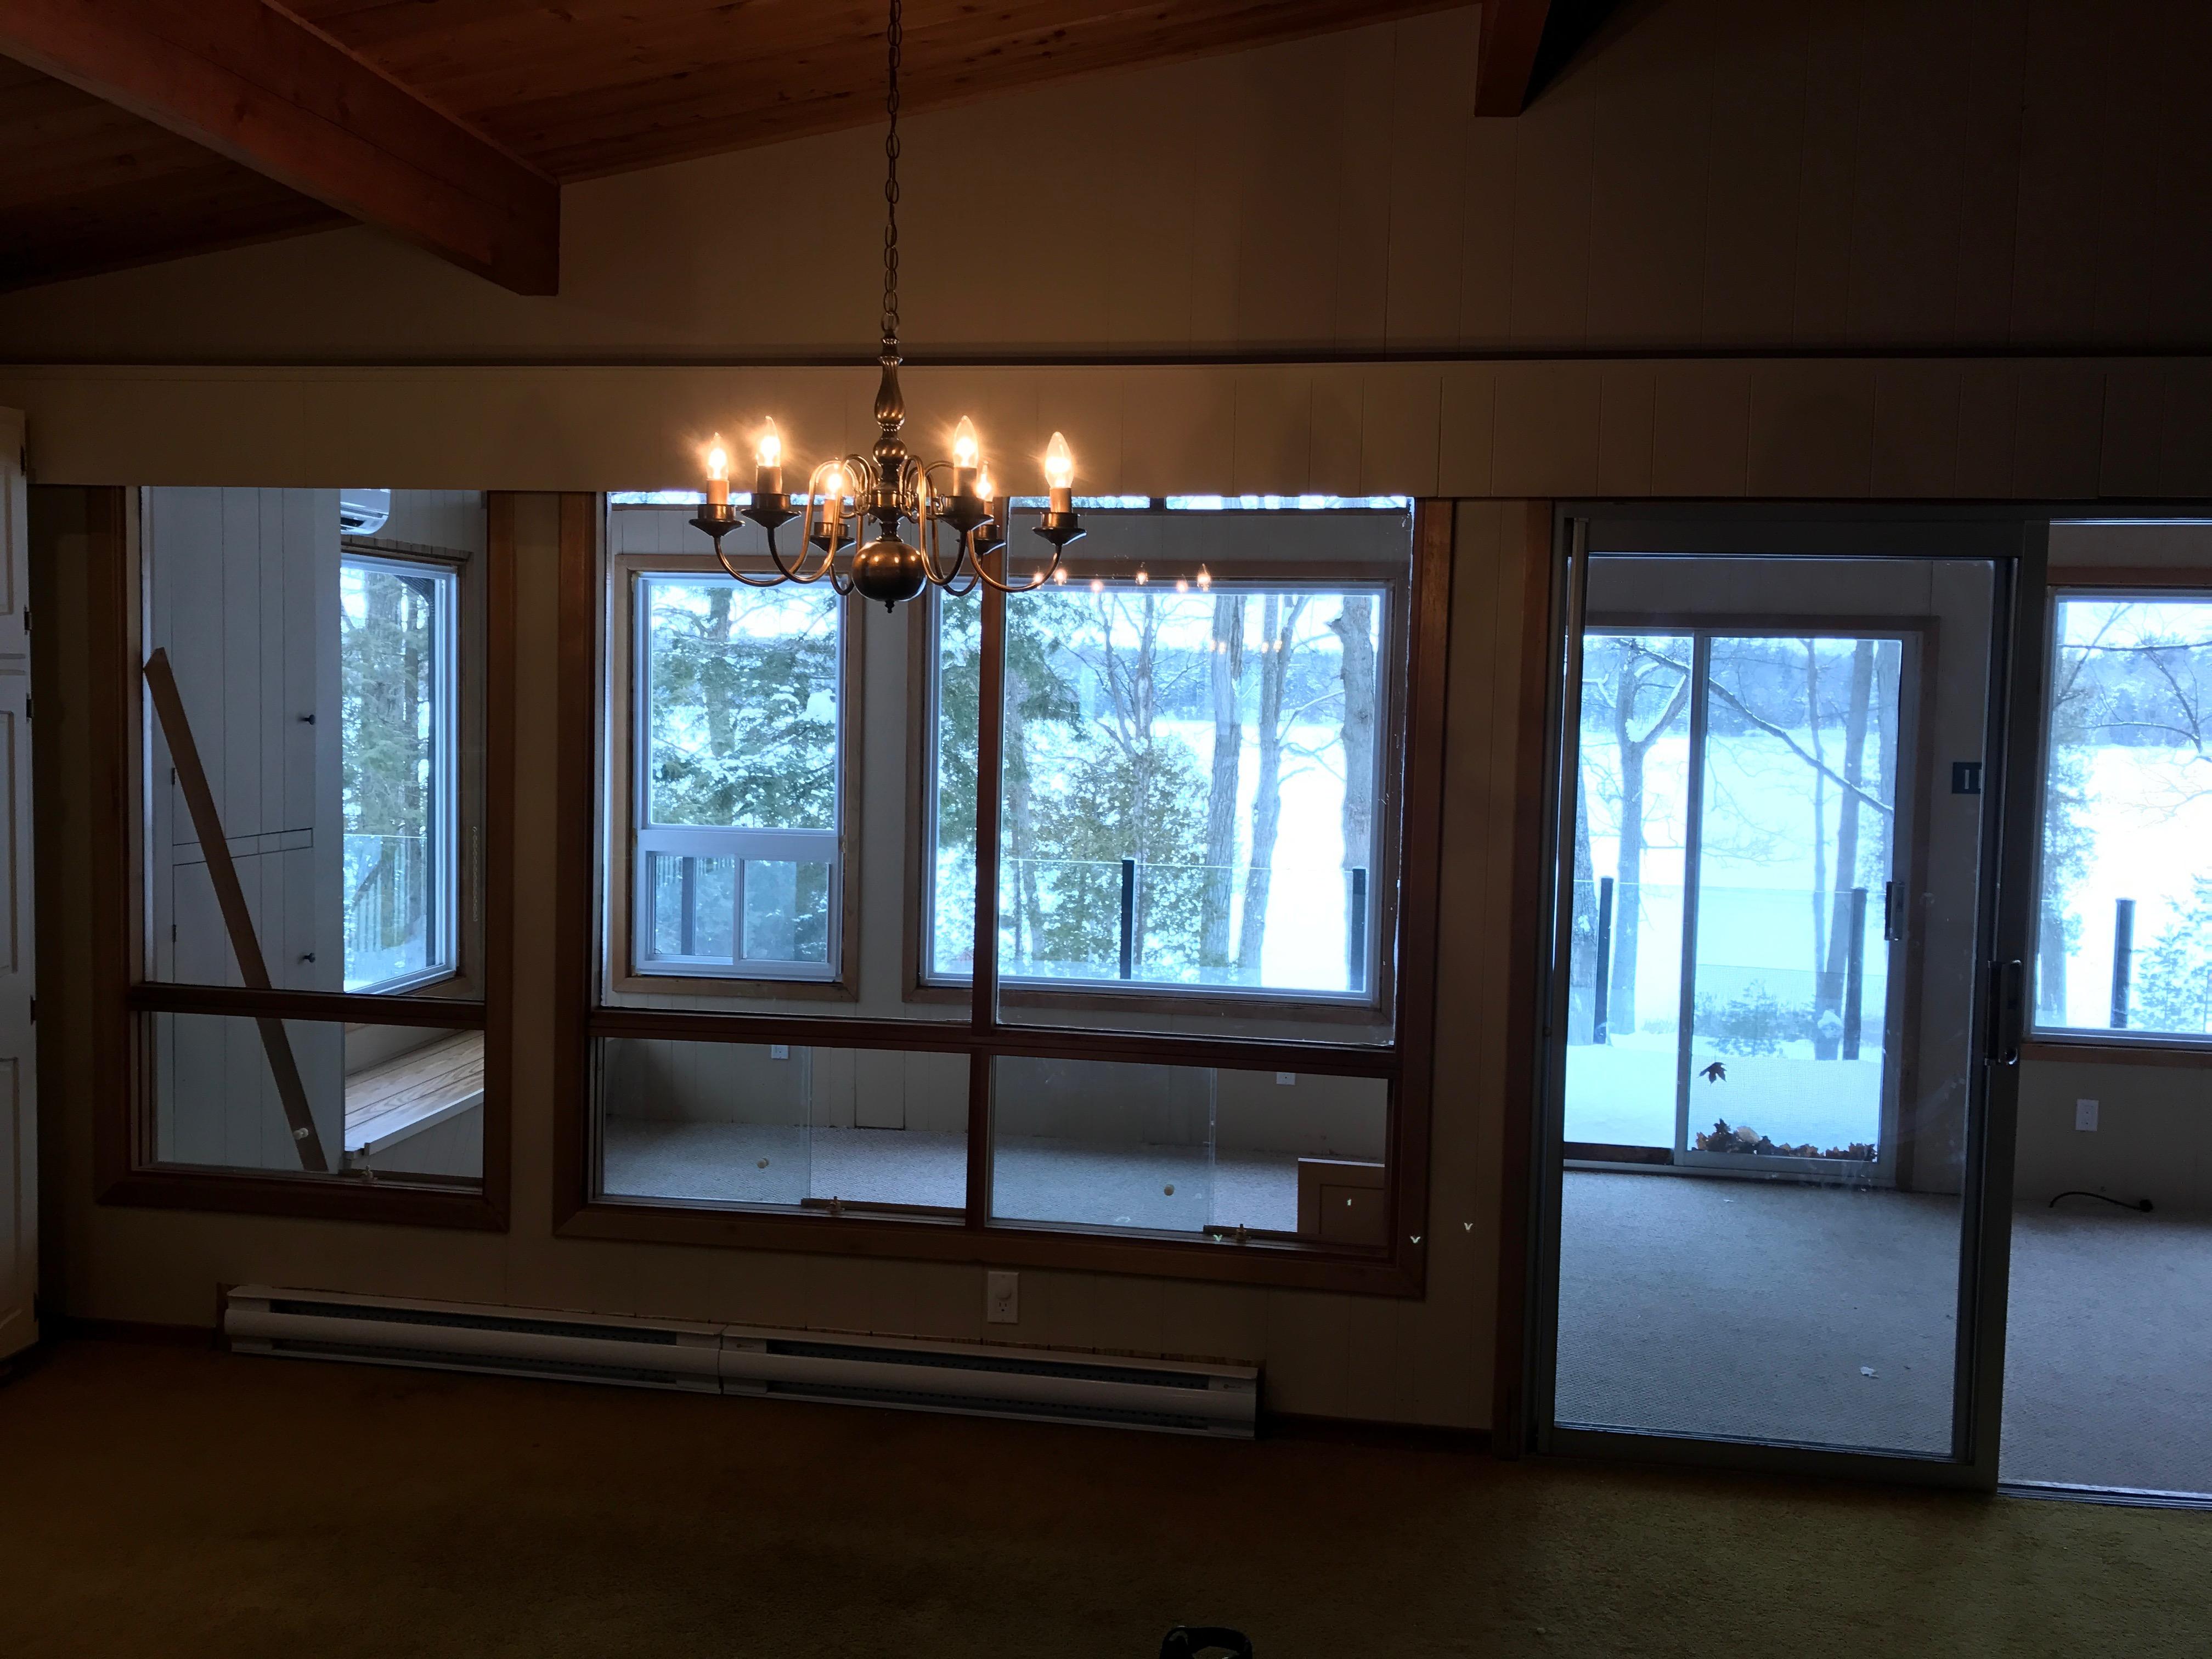 Design and renovate project - The Revival  - Interior Pre-Construction